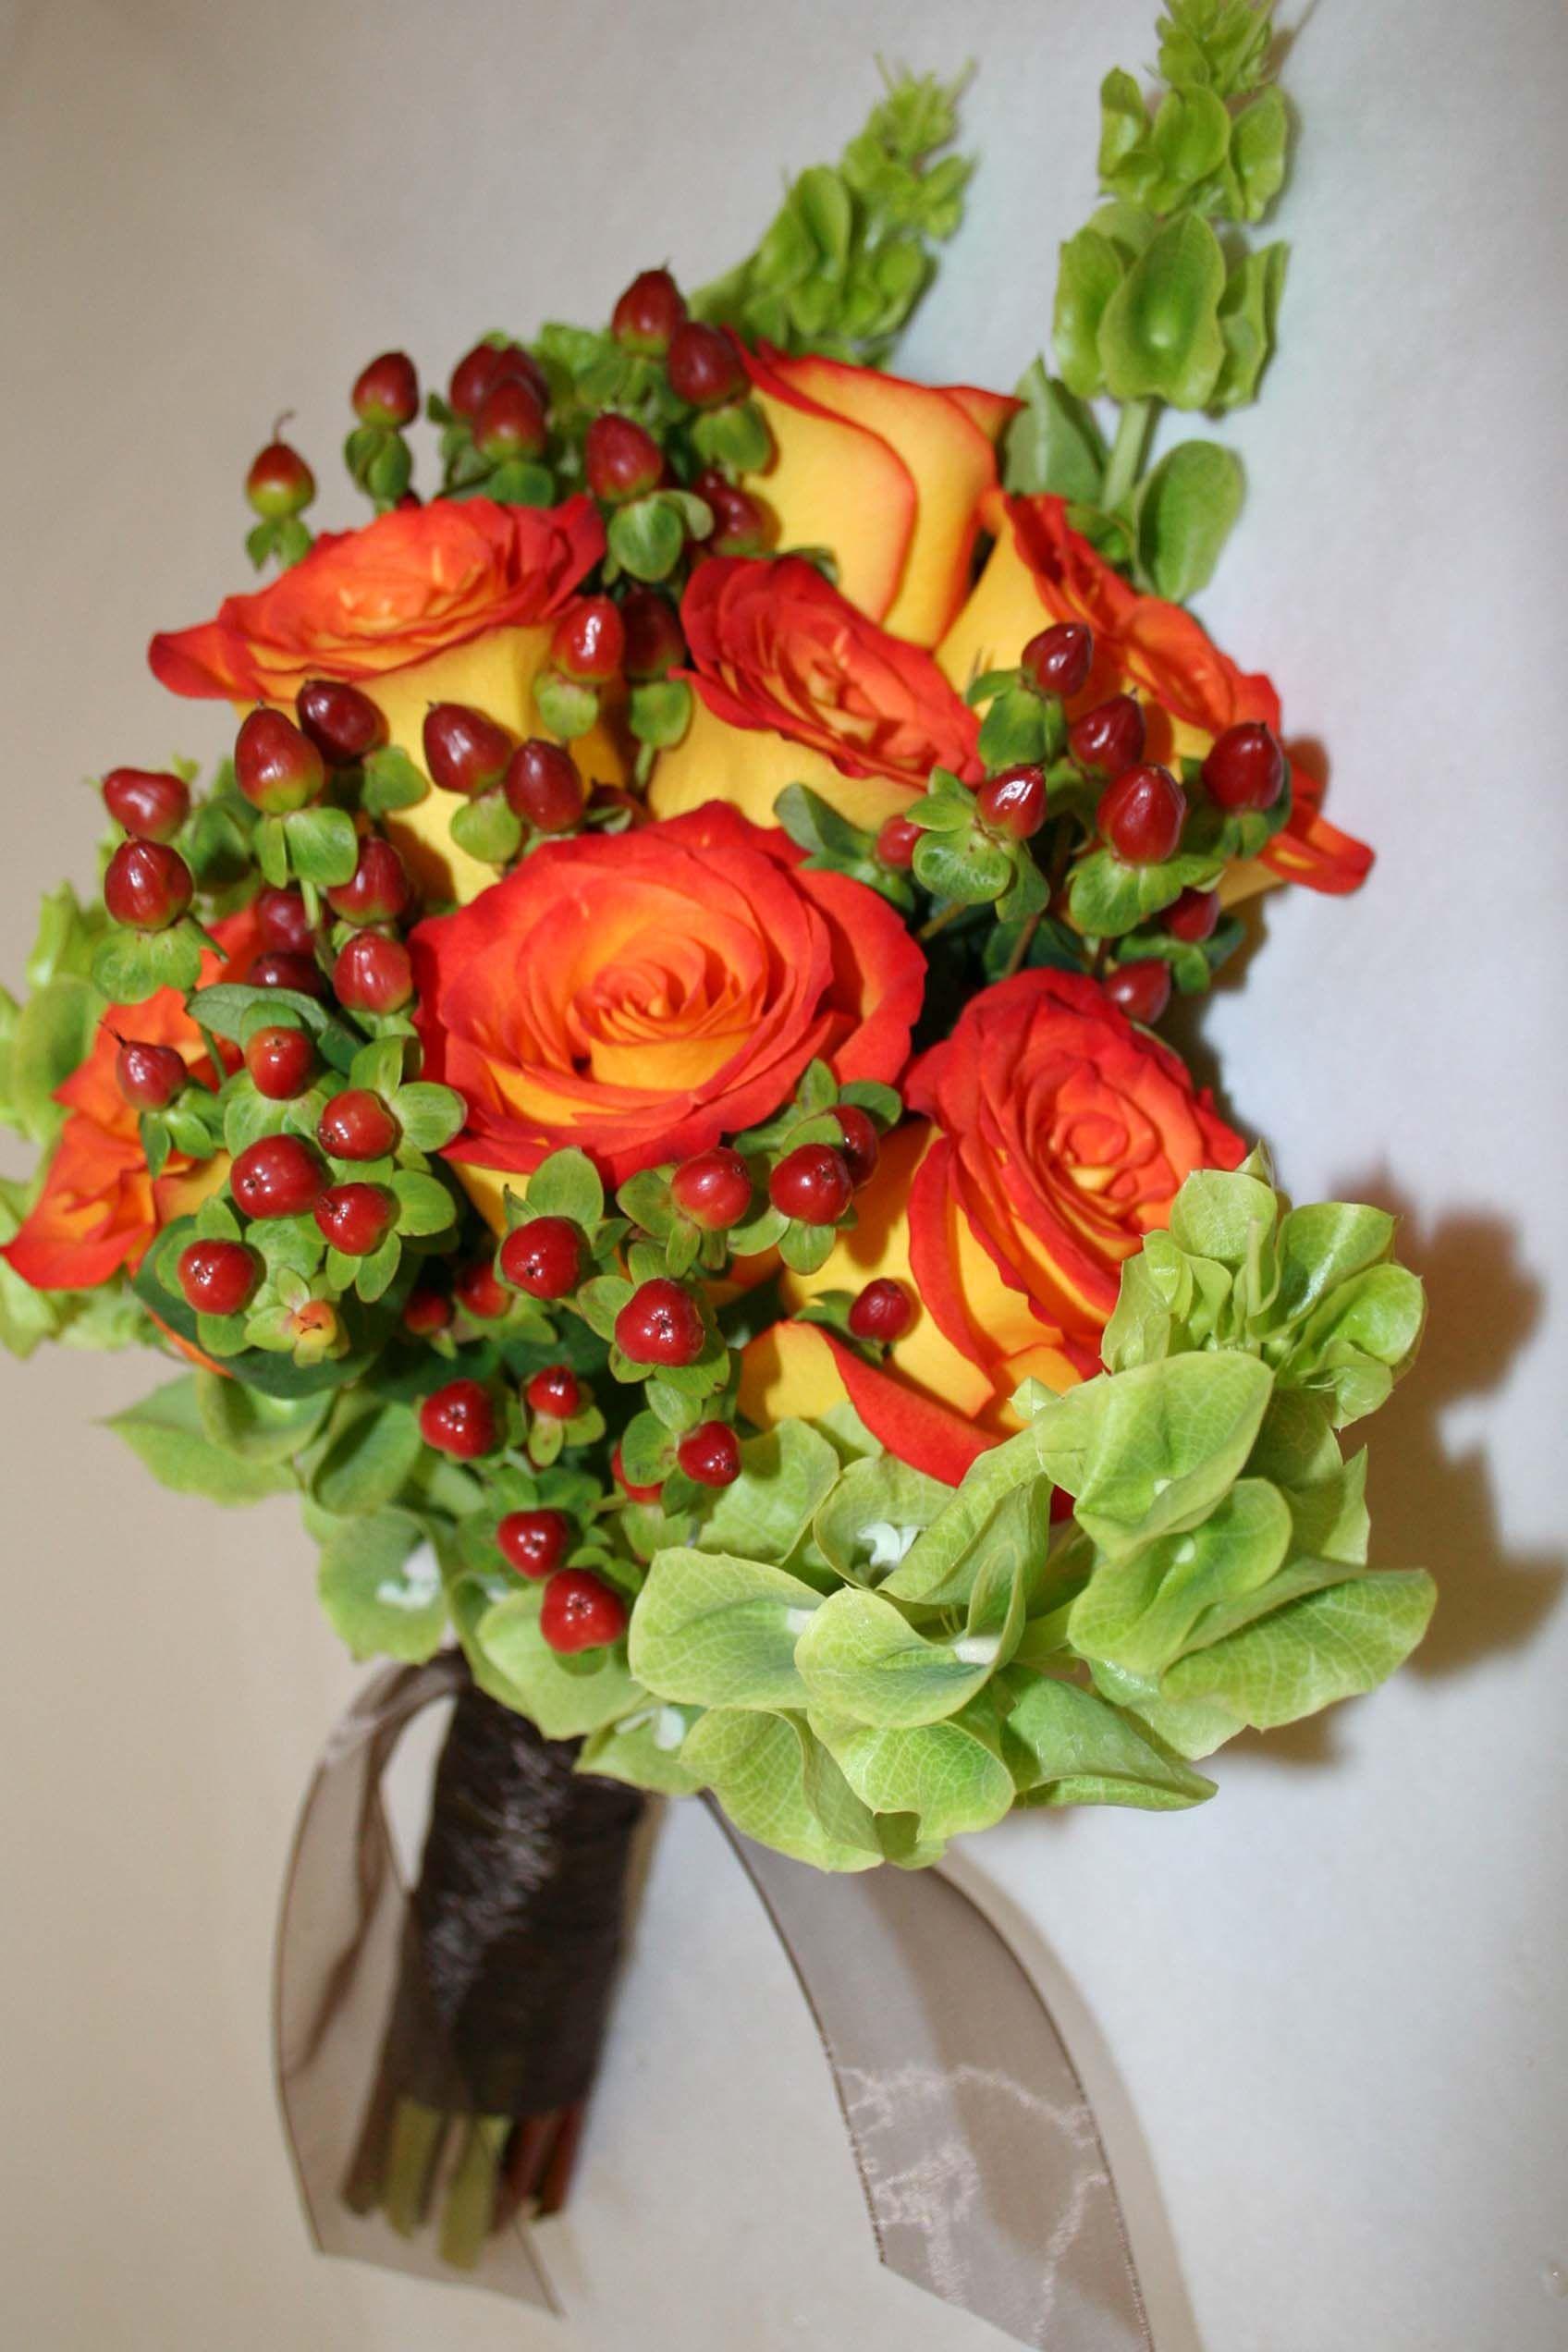 circus rose,red hypercum,bells of ireland